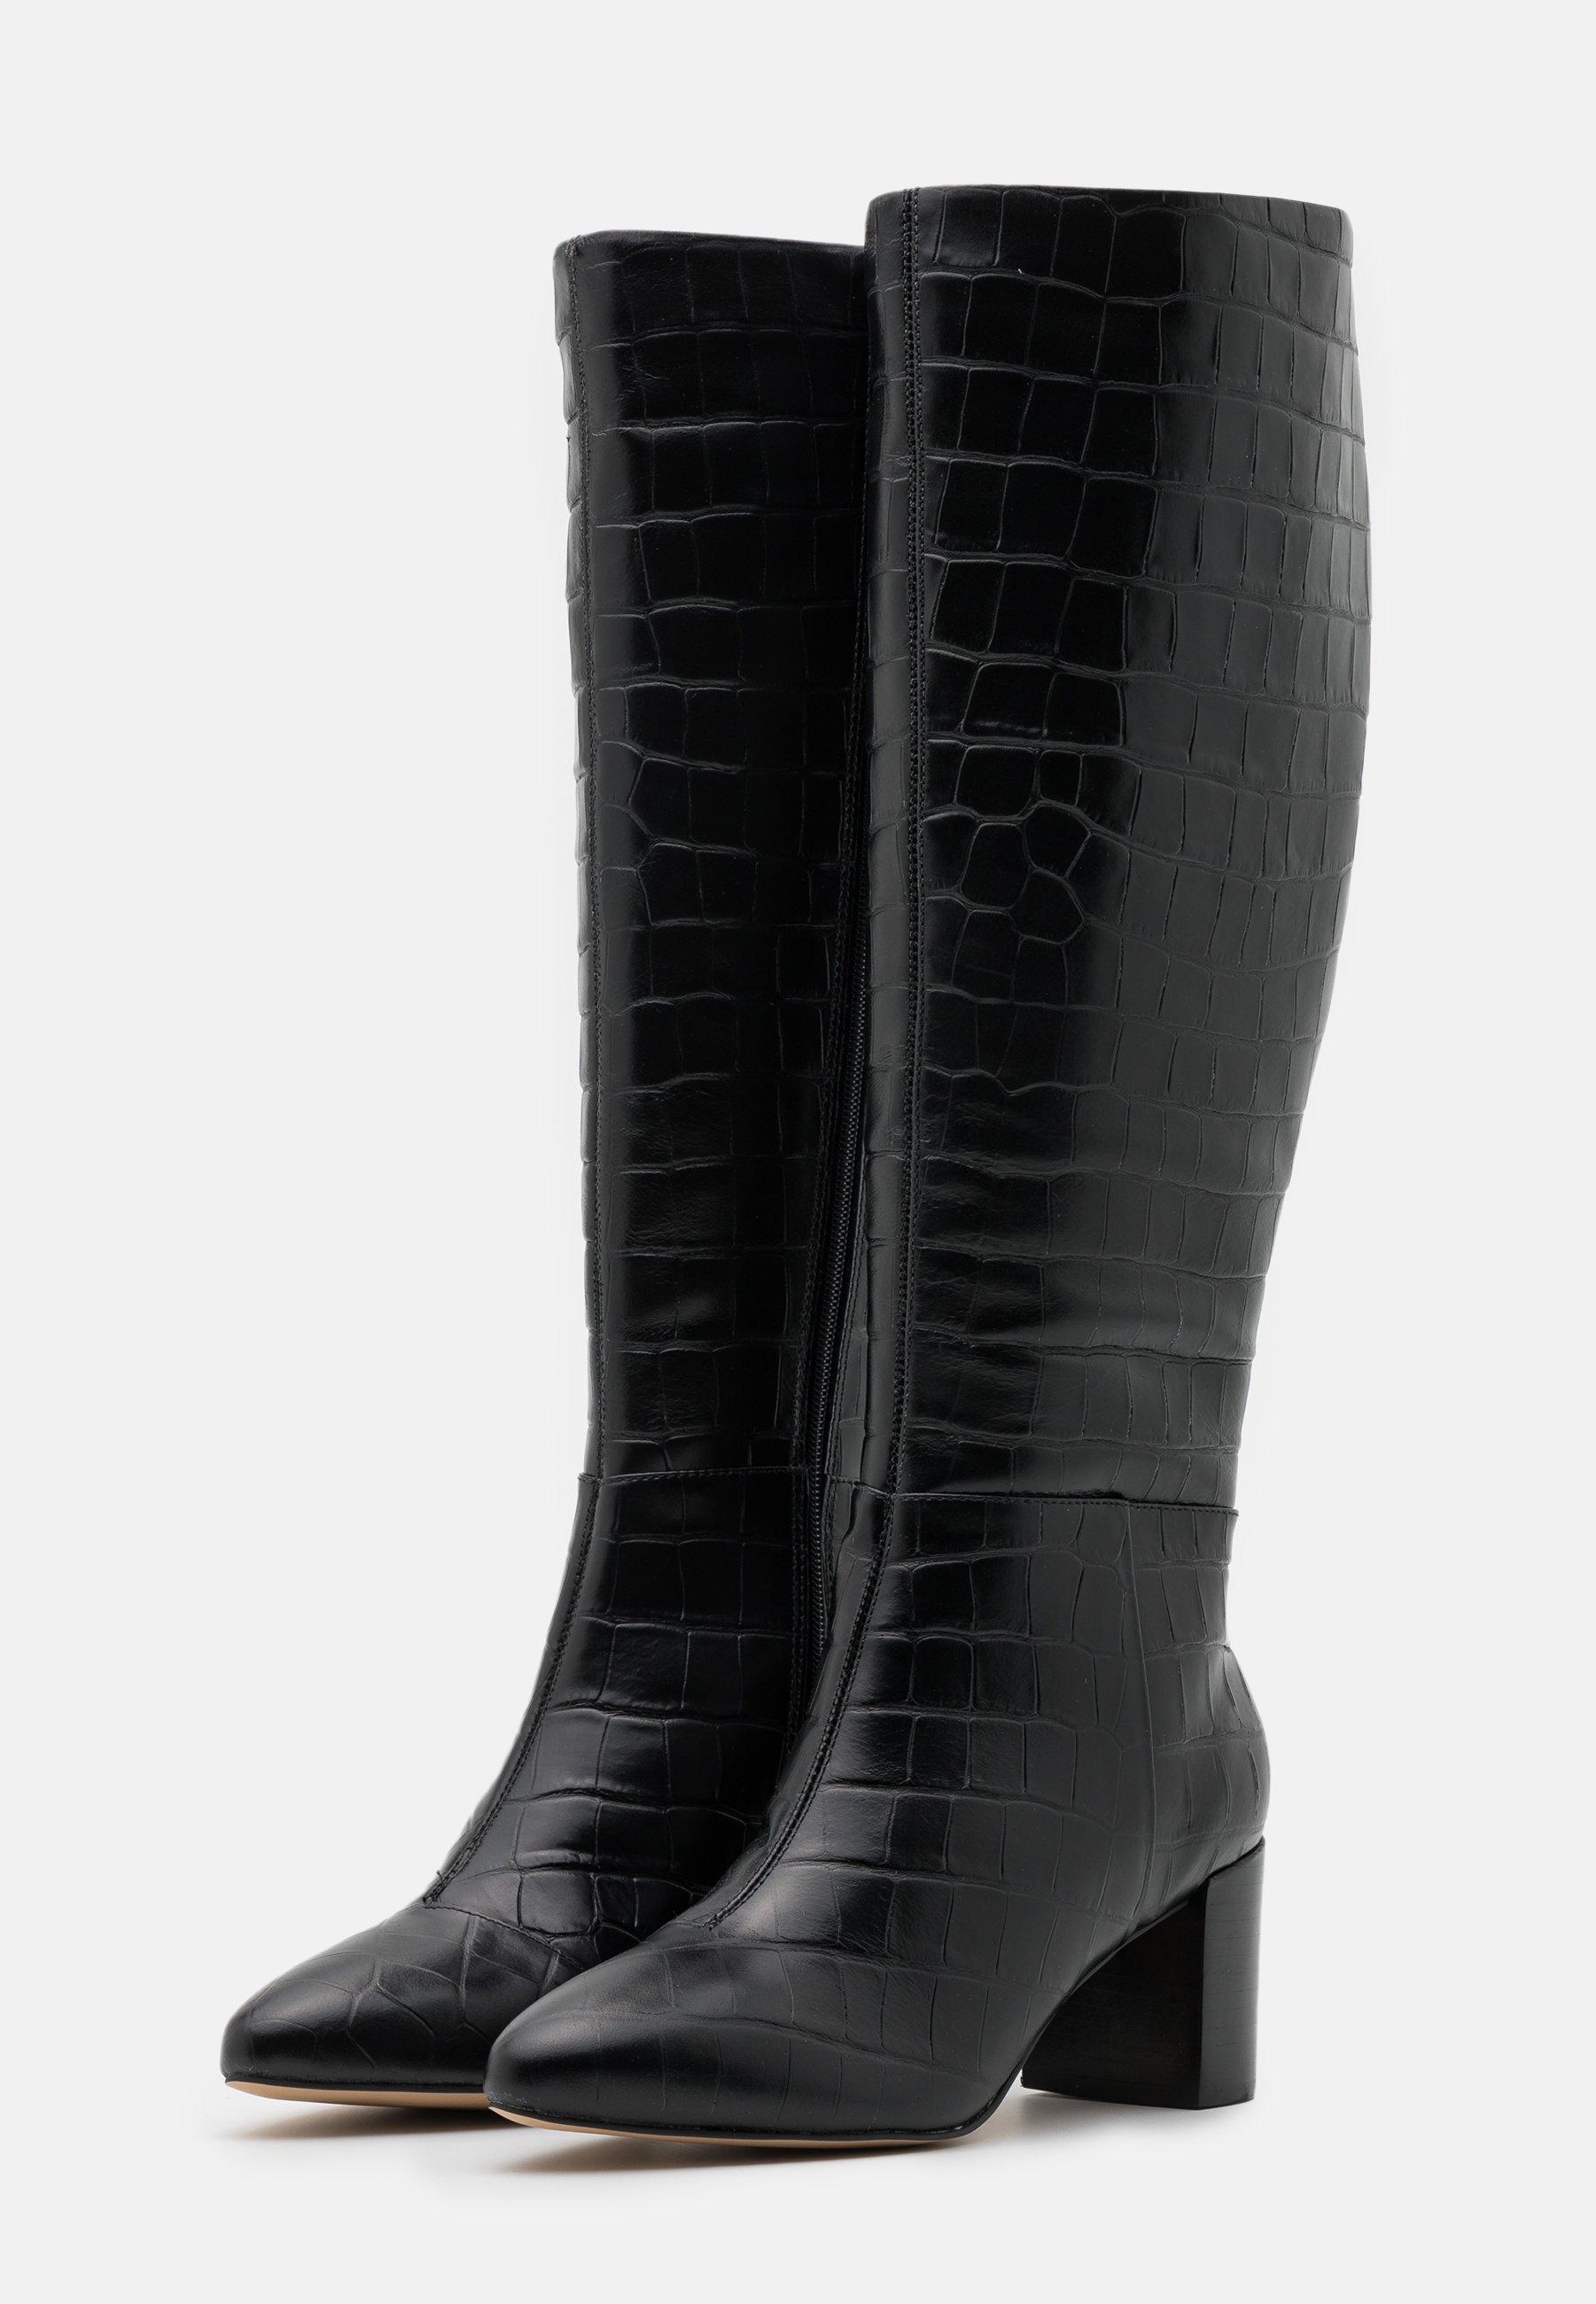 Dune London SAFFIA Stiefel black/schwarz